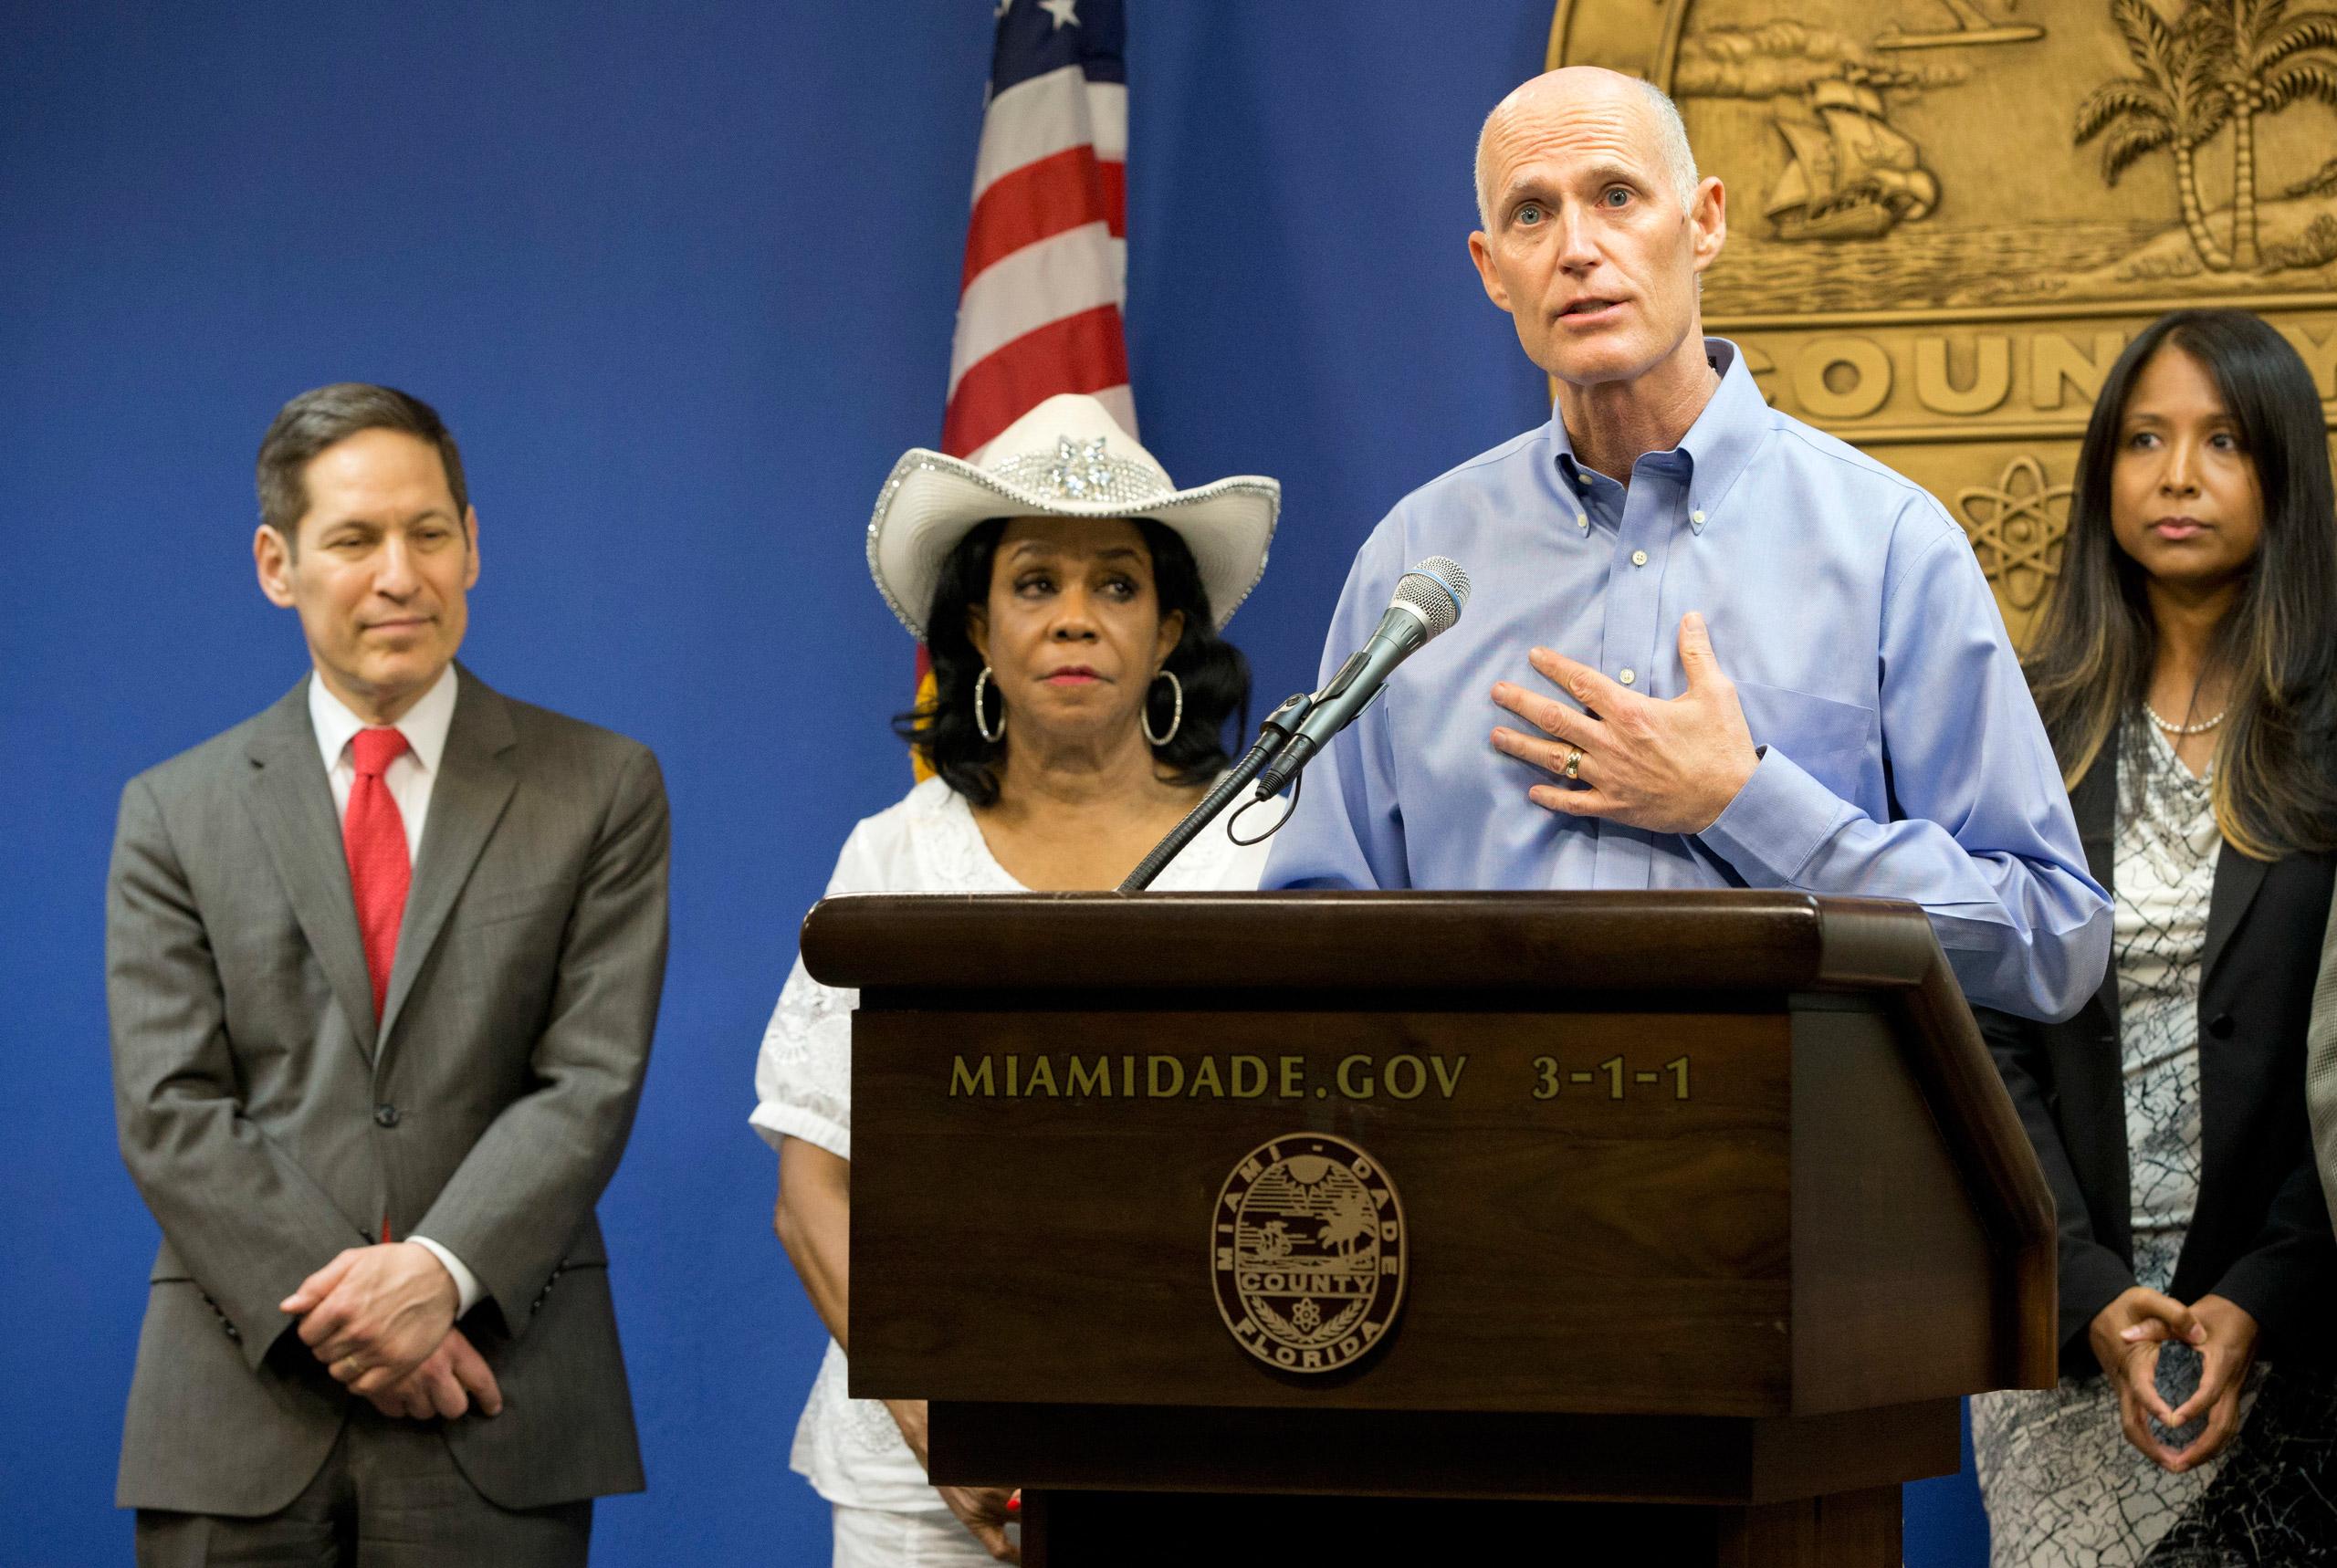 Florida Gov. Rick Scott speaks during a news conference in Doral, Fla. on Aug. 4, 2016.